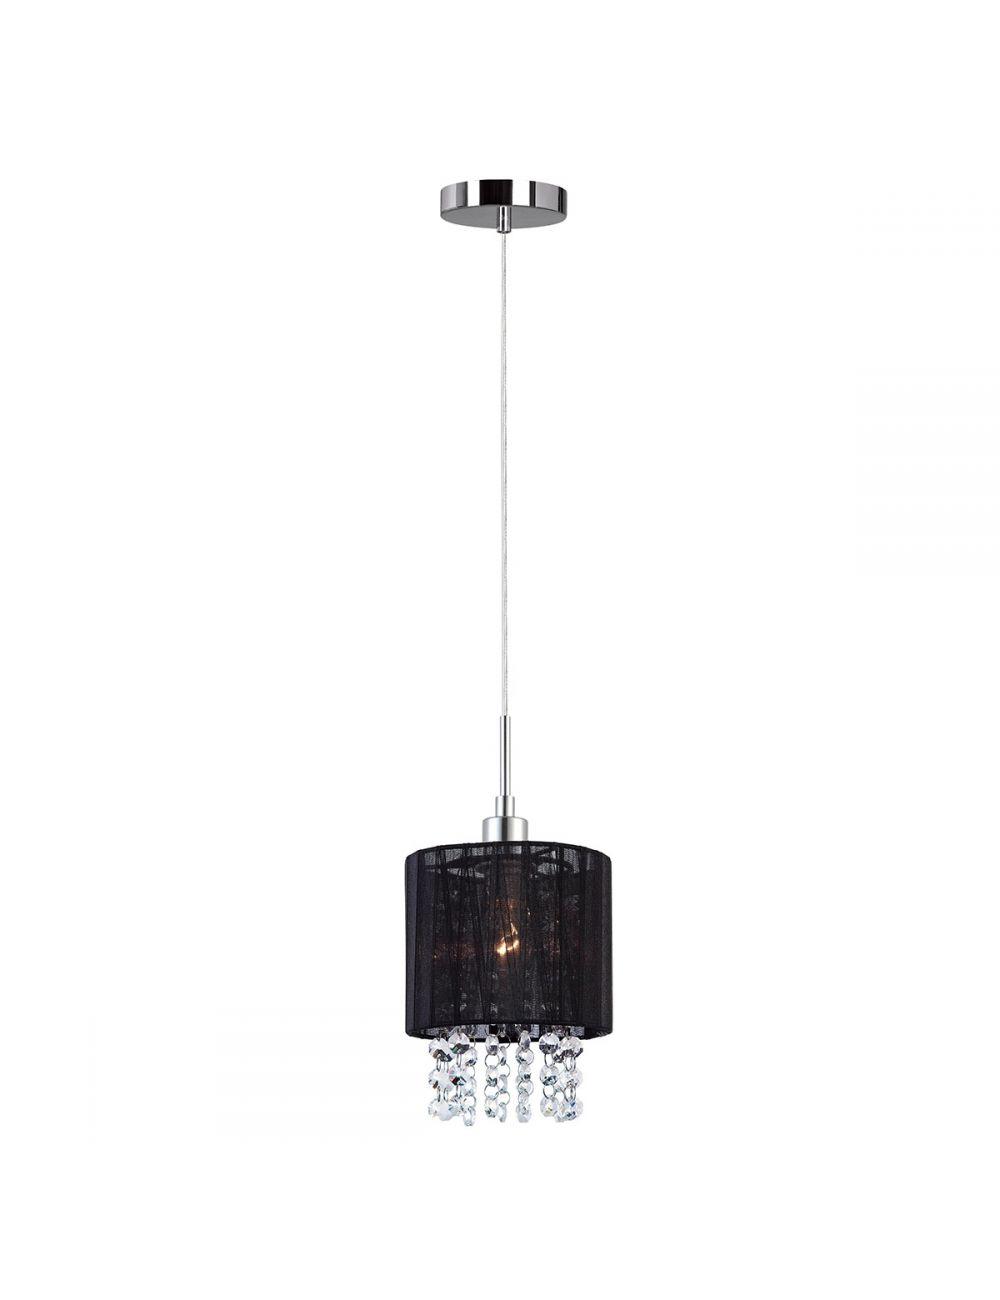 MDM1953-1 BK  Astra lampa 1pł czarna